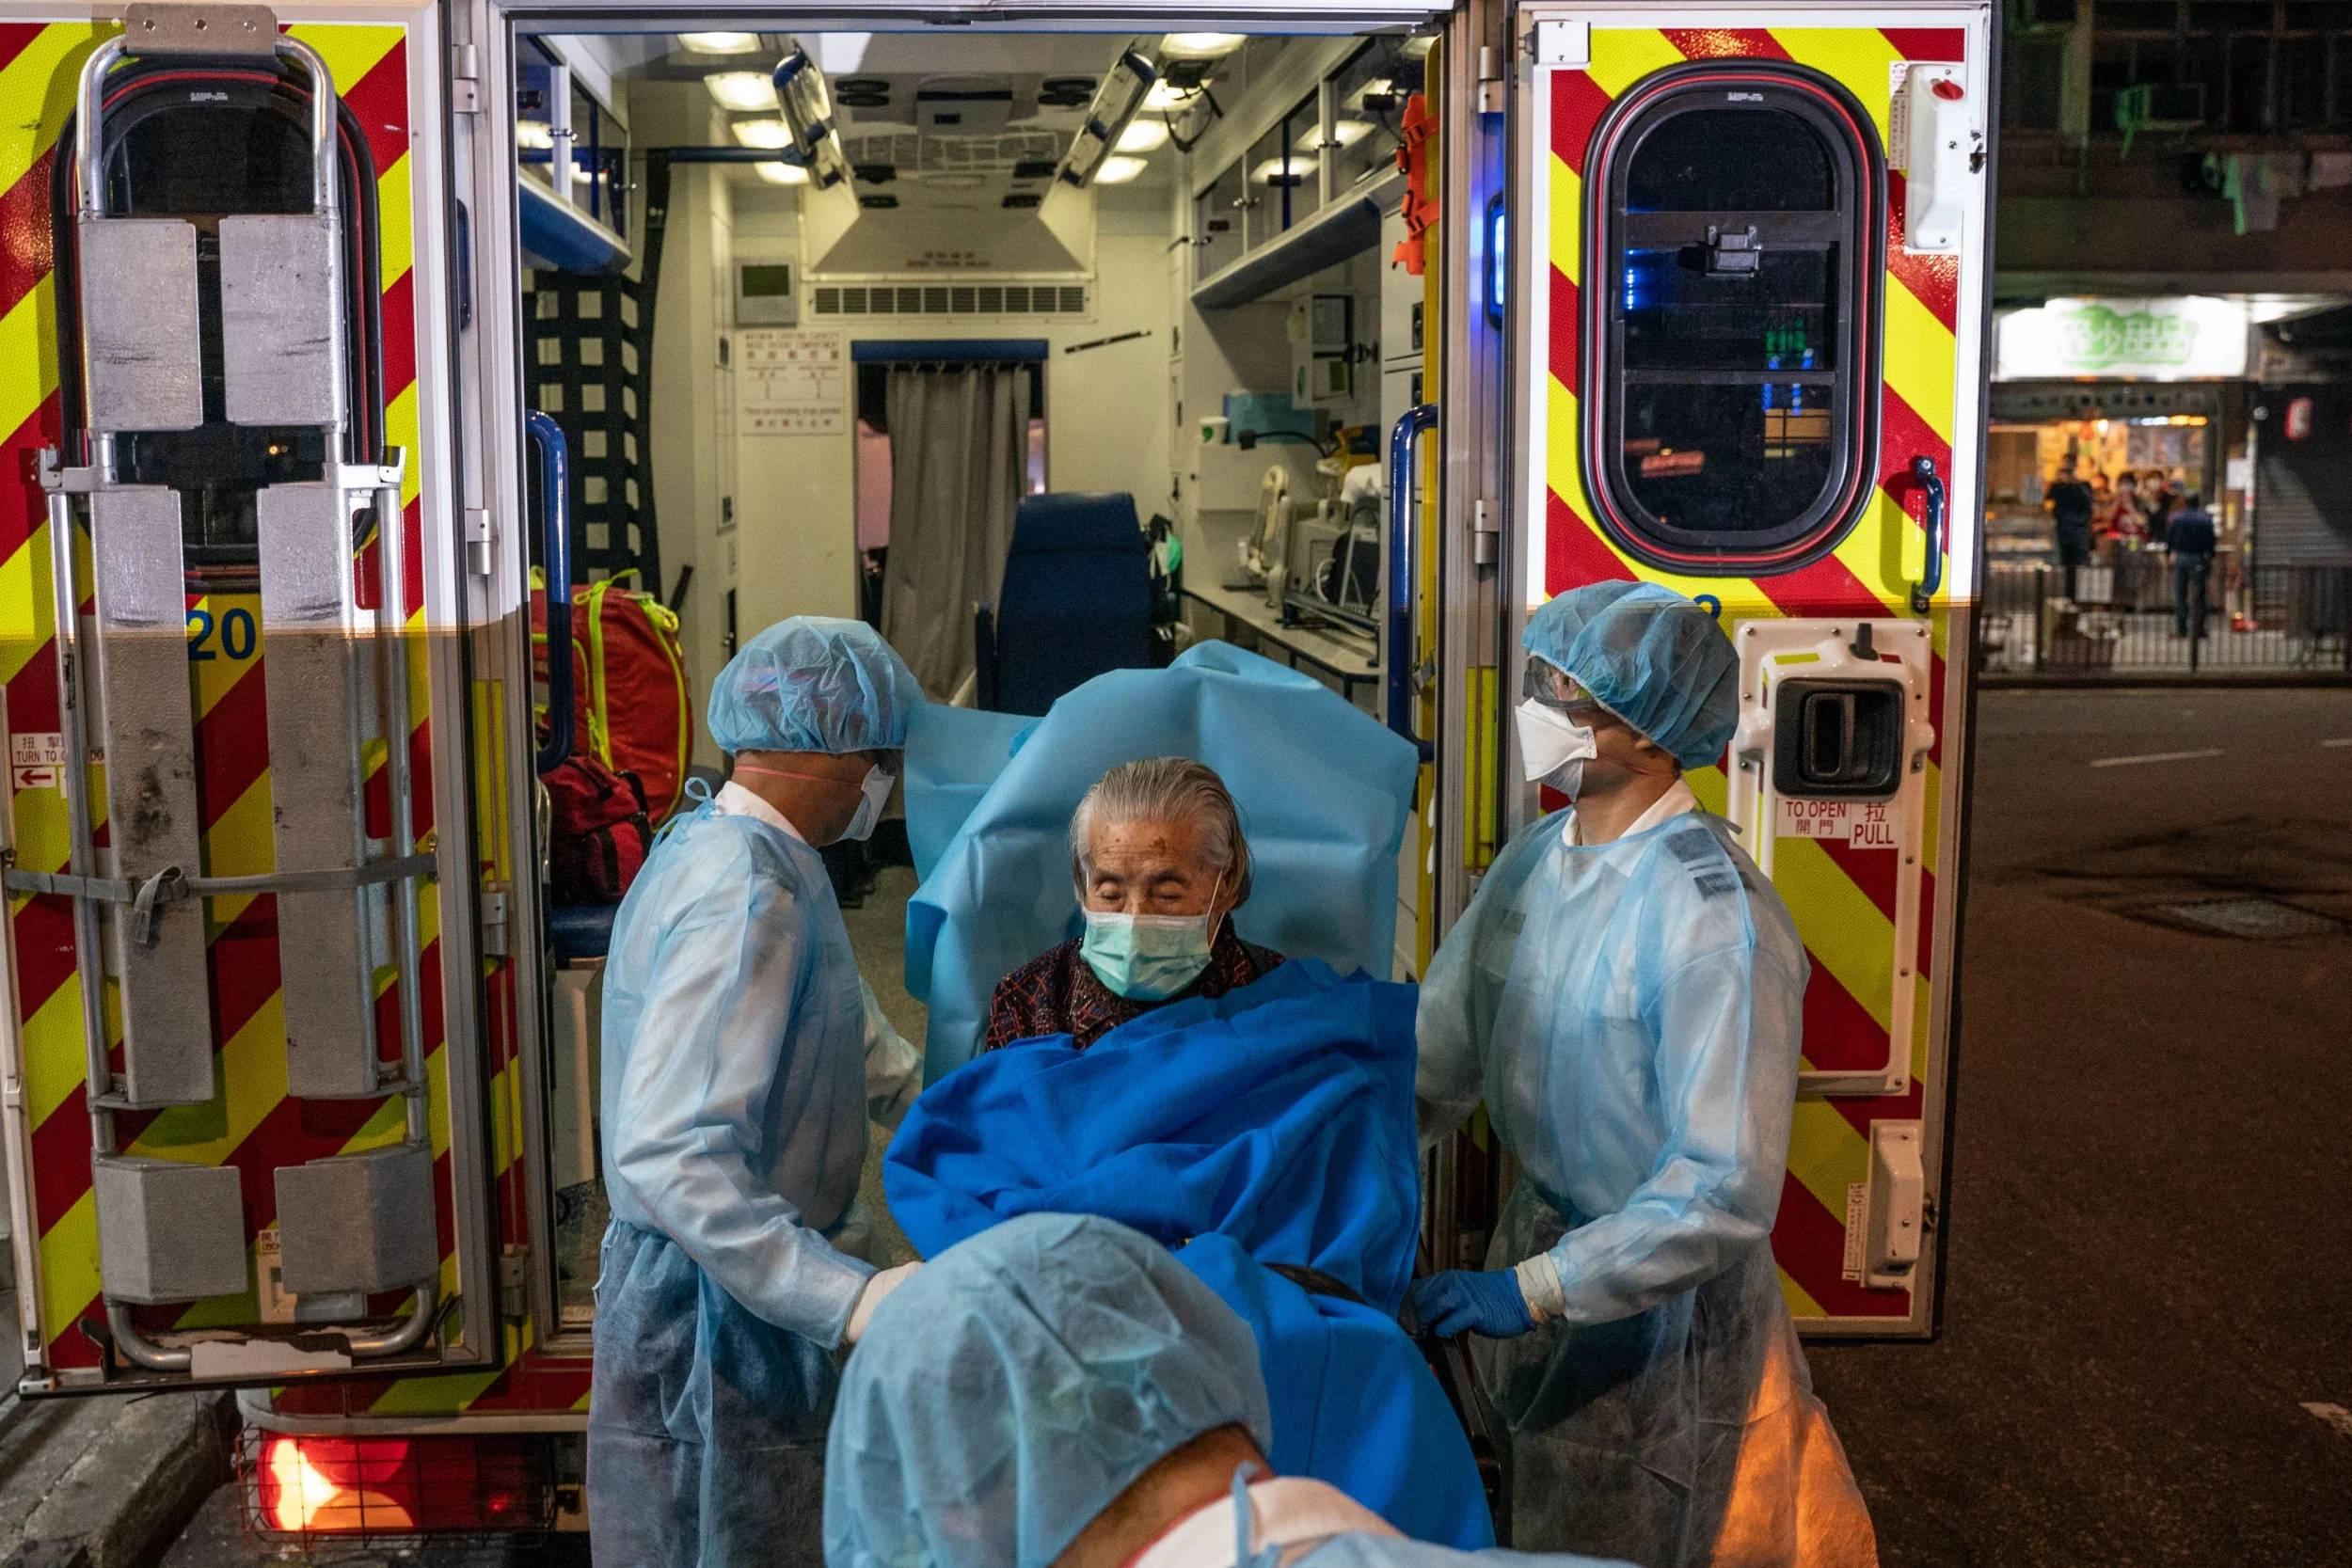 Coronavirus: Australia confirms first cases of deadly illness ...